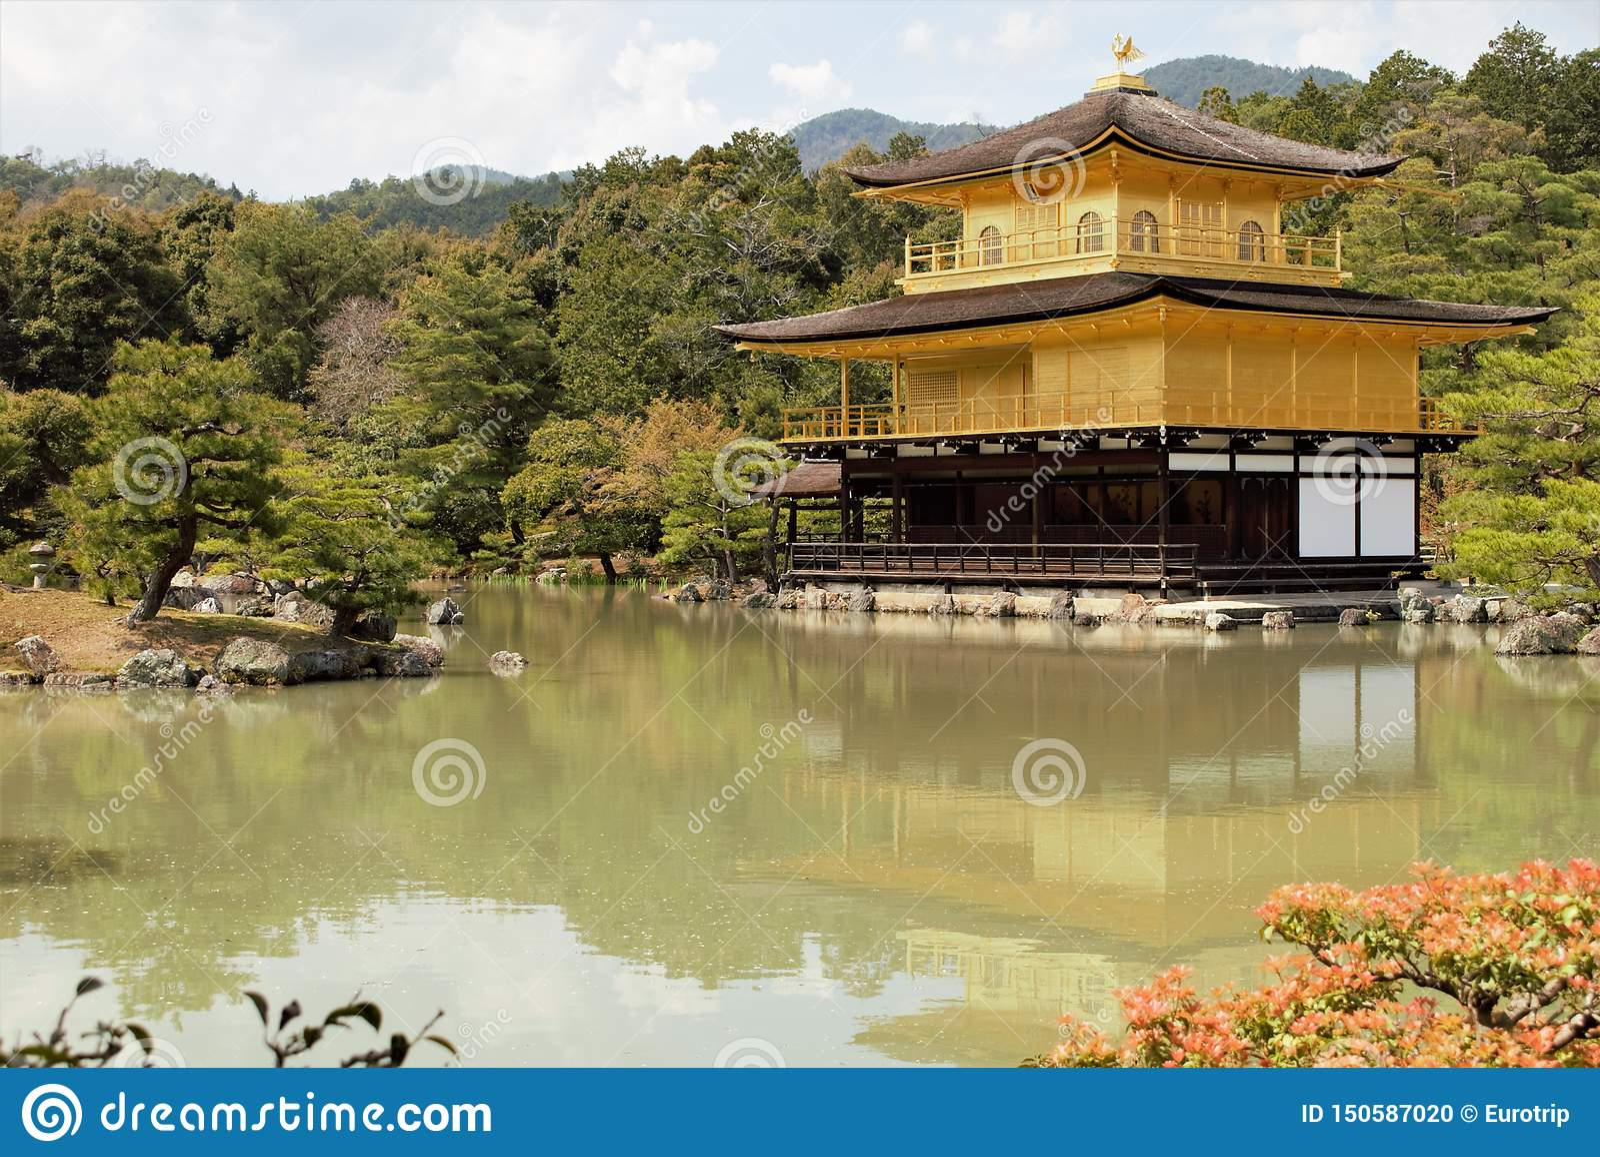 Pavilhão dourado Kinkaku do templo budista japonês Kinkaku-ji, Rokuon-ji, Kyoto, Japão